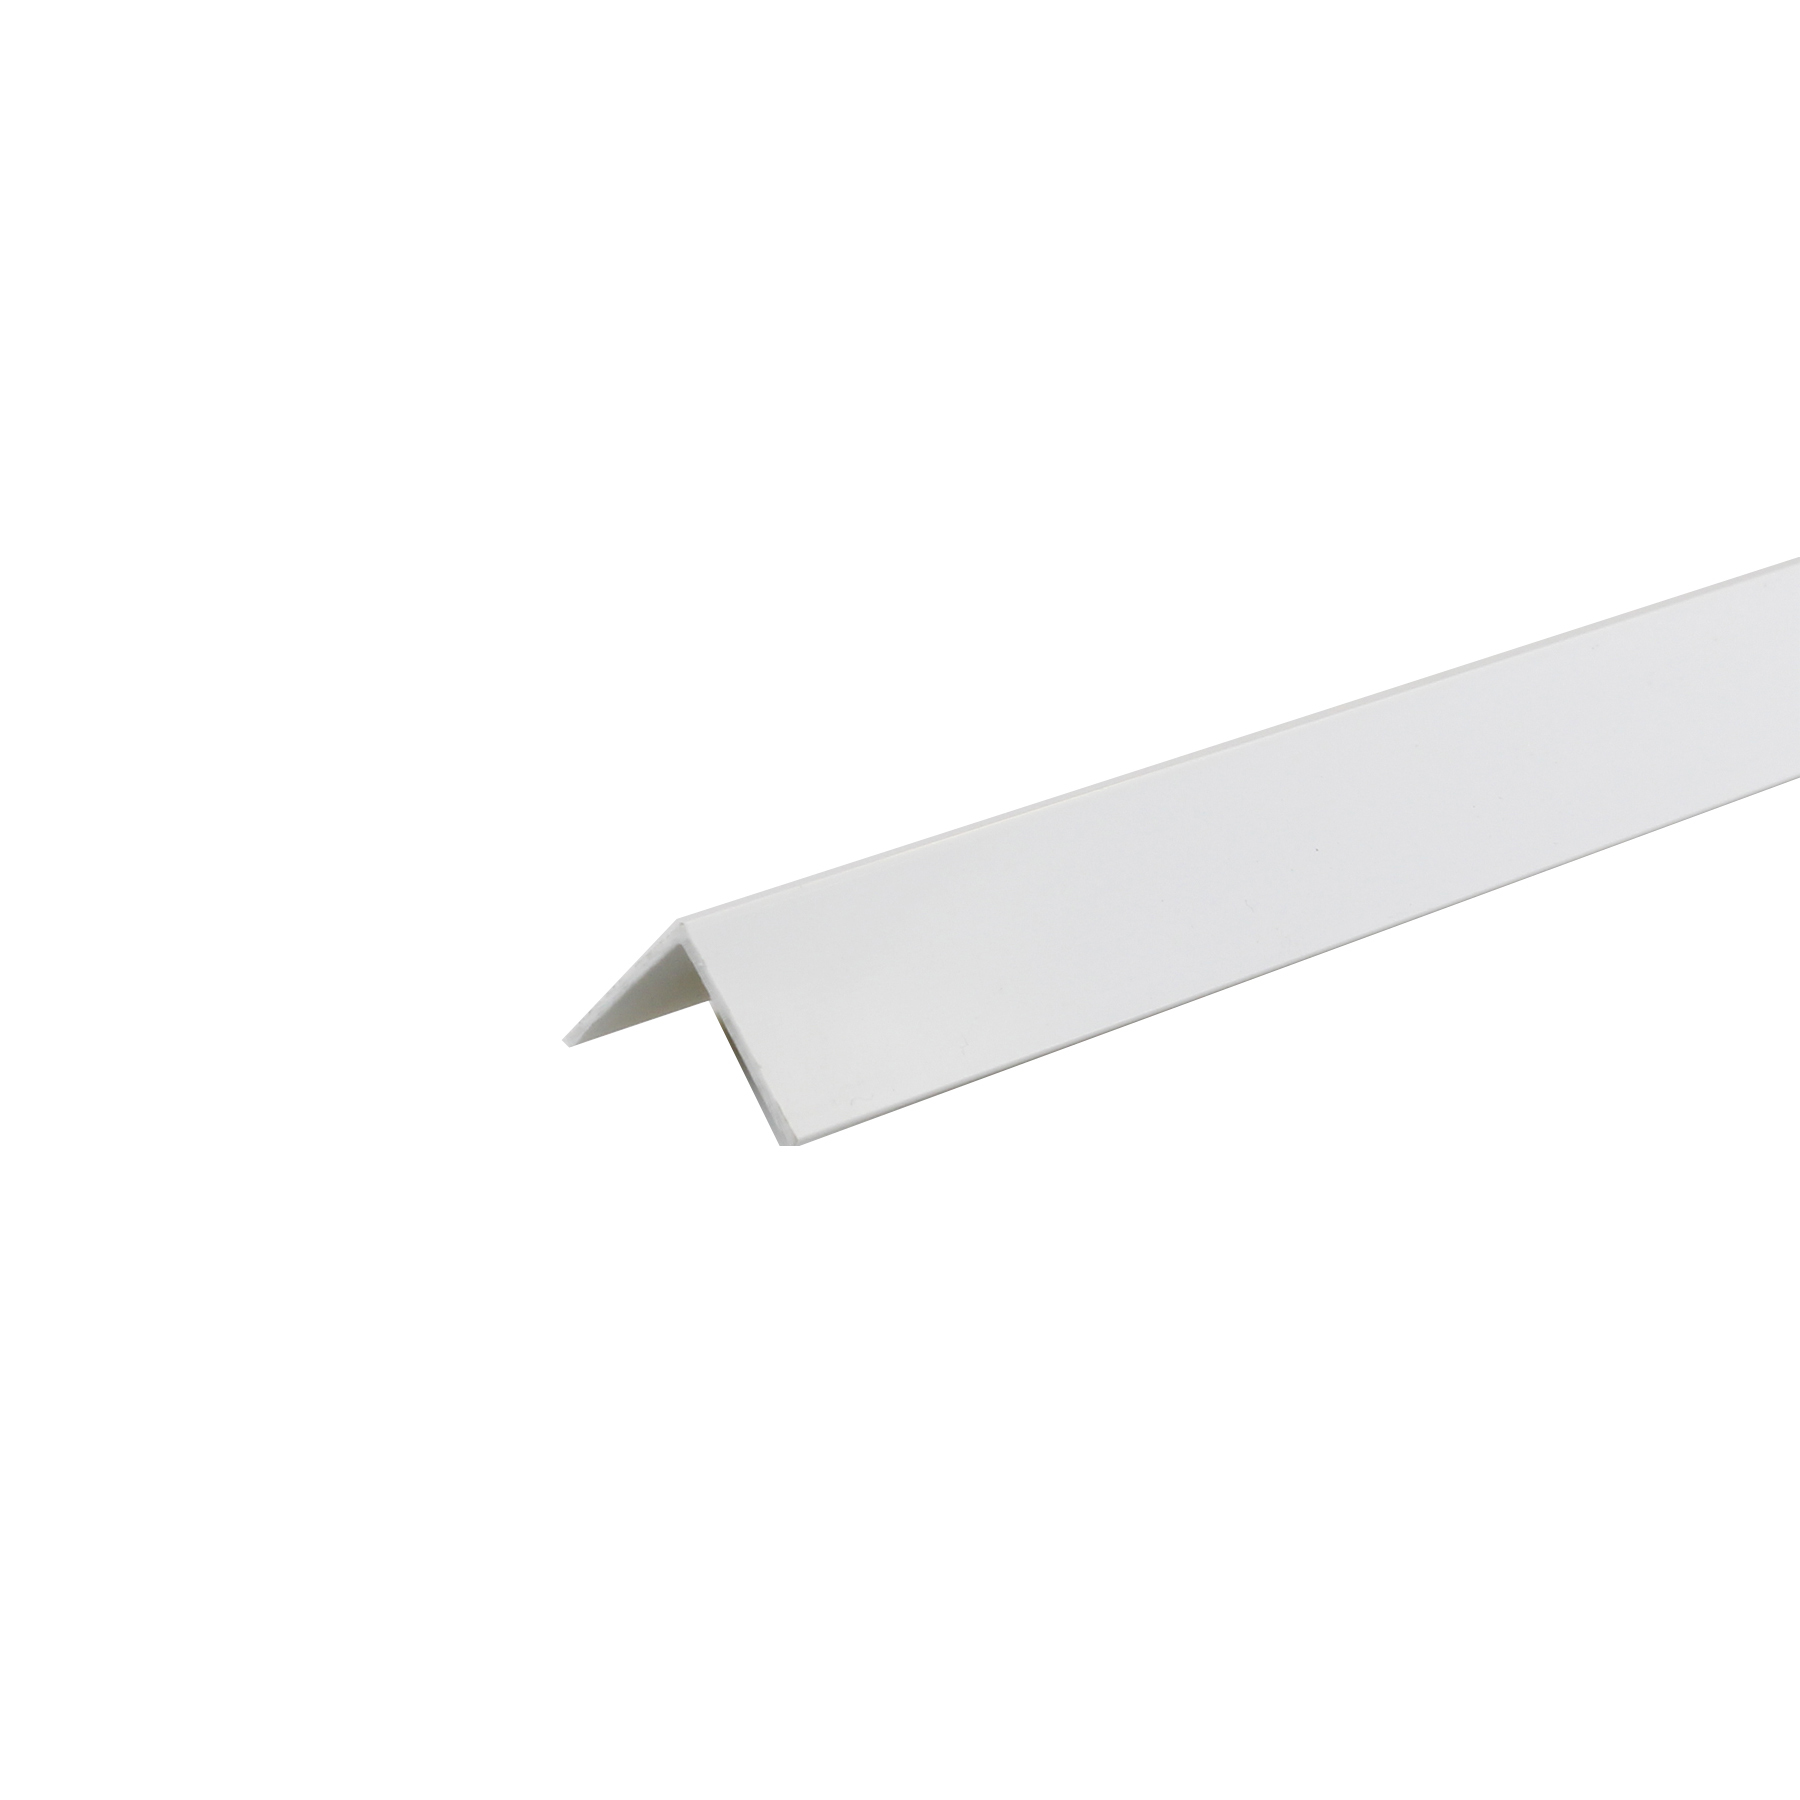 Perfil Canto PVC Porcelana 2mx3cm